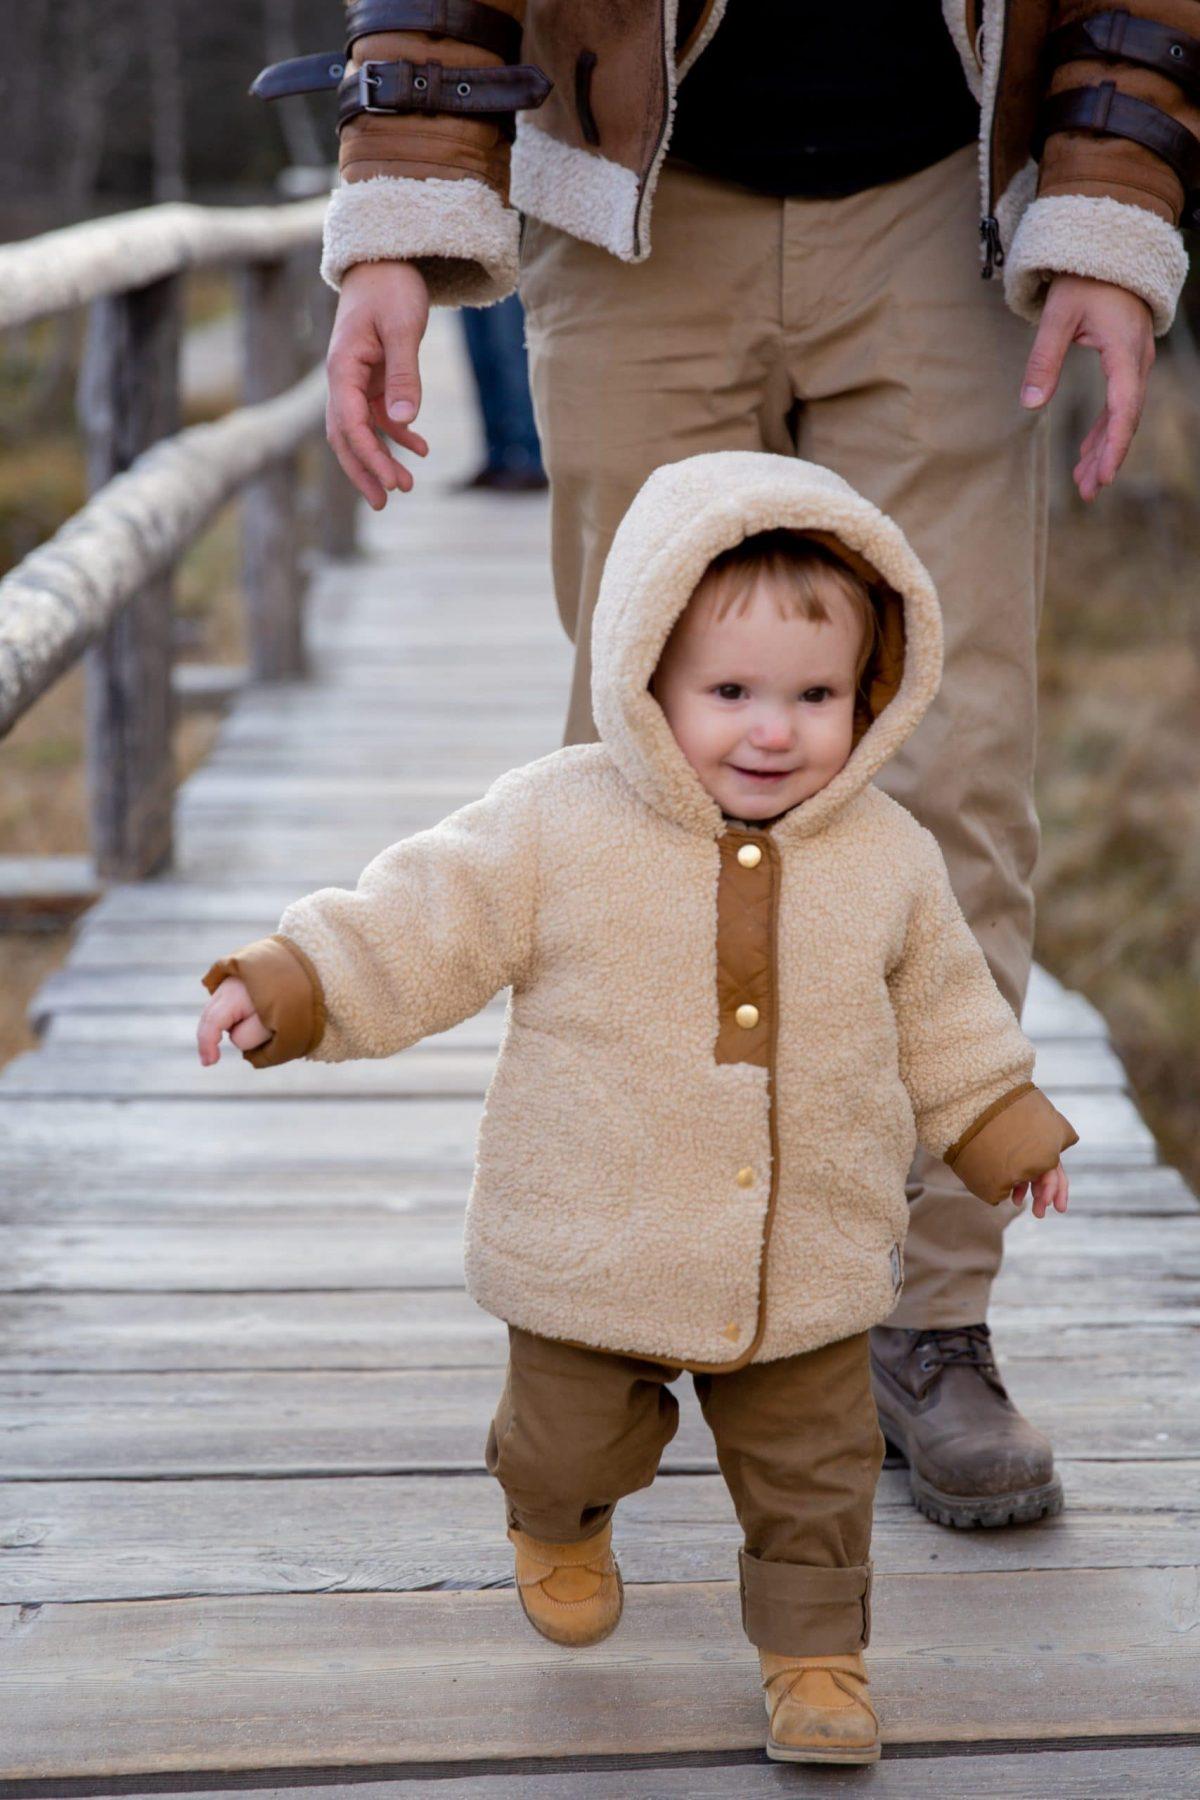 enseñar a su bebé a caminar